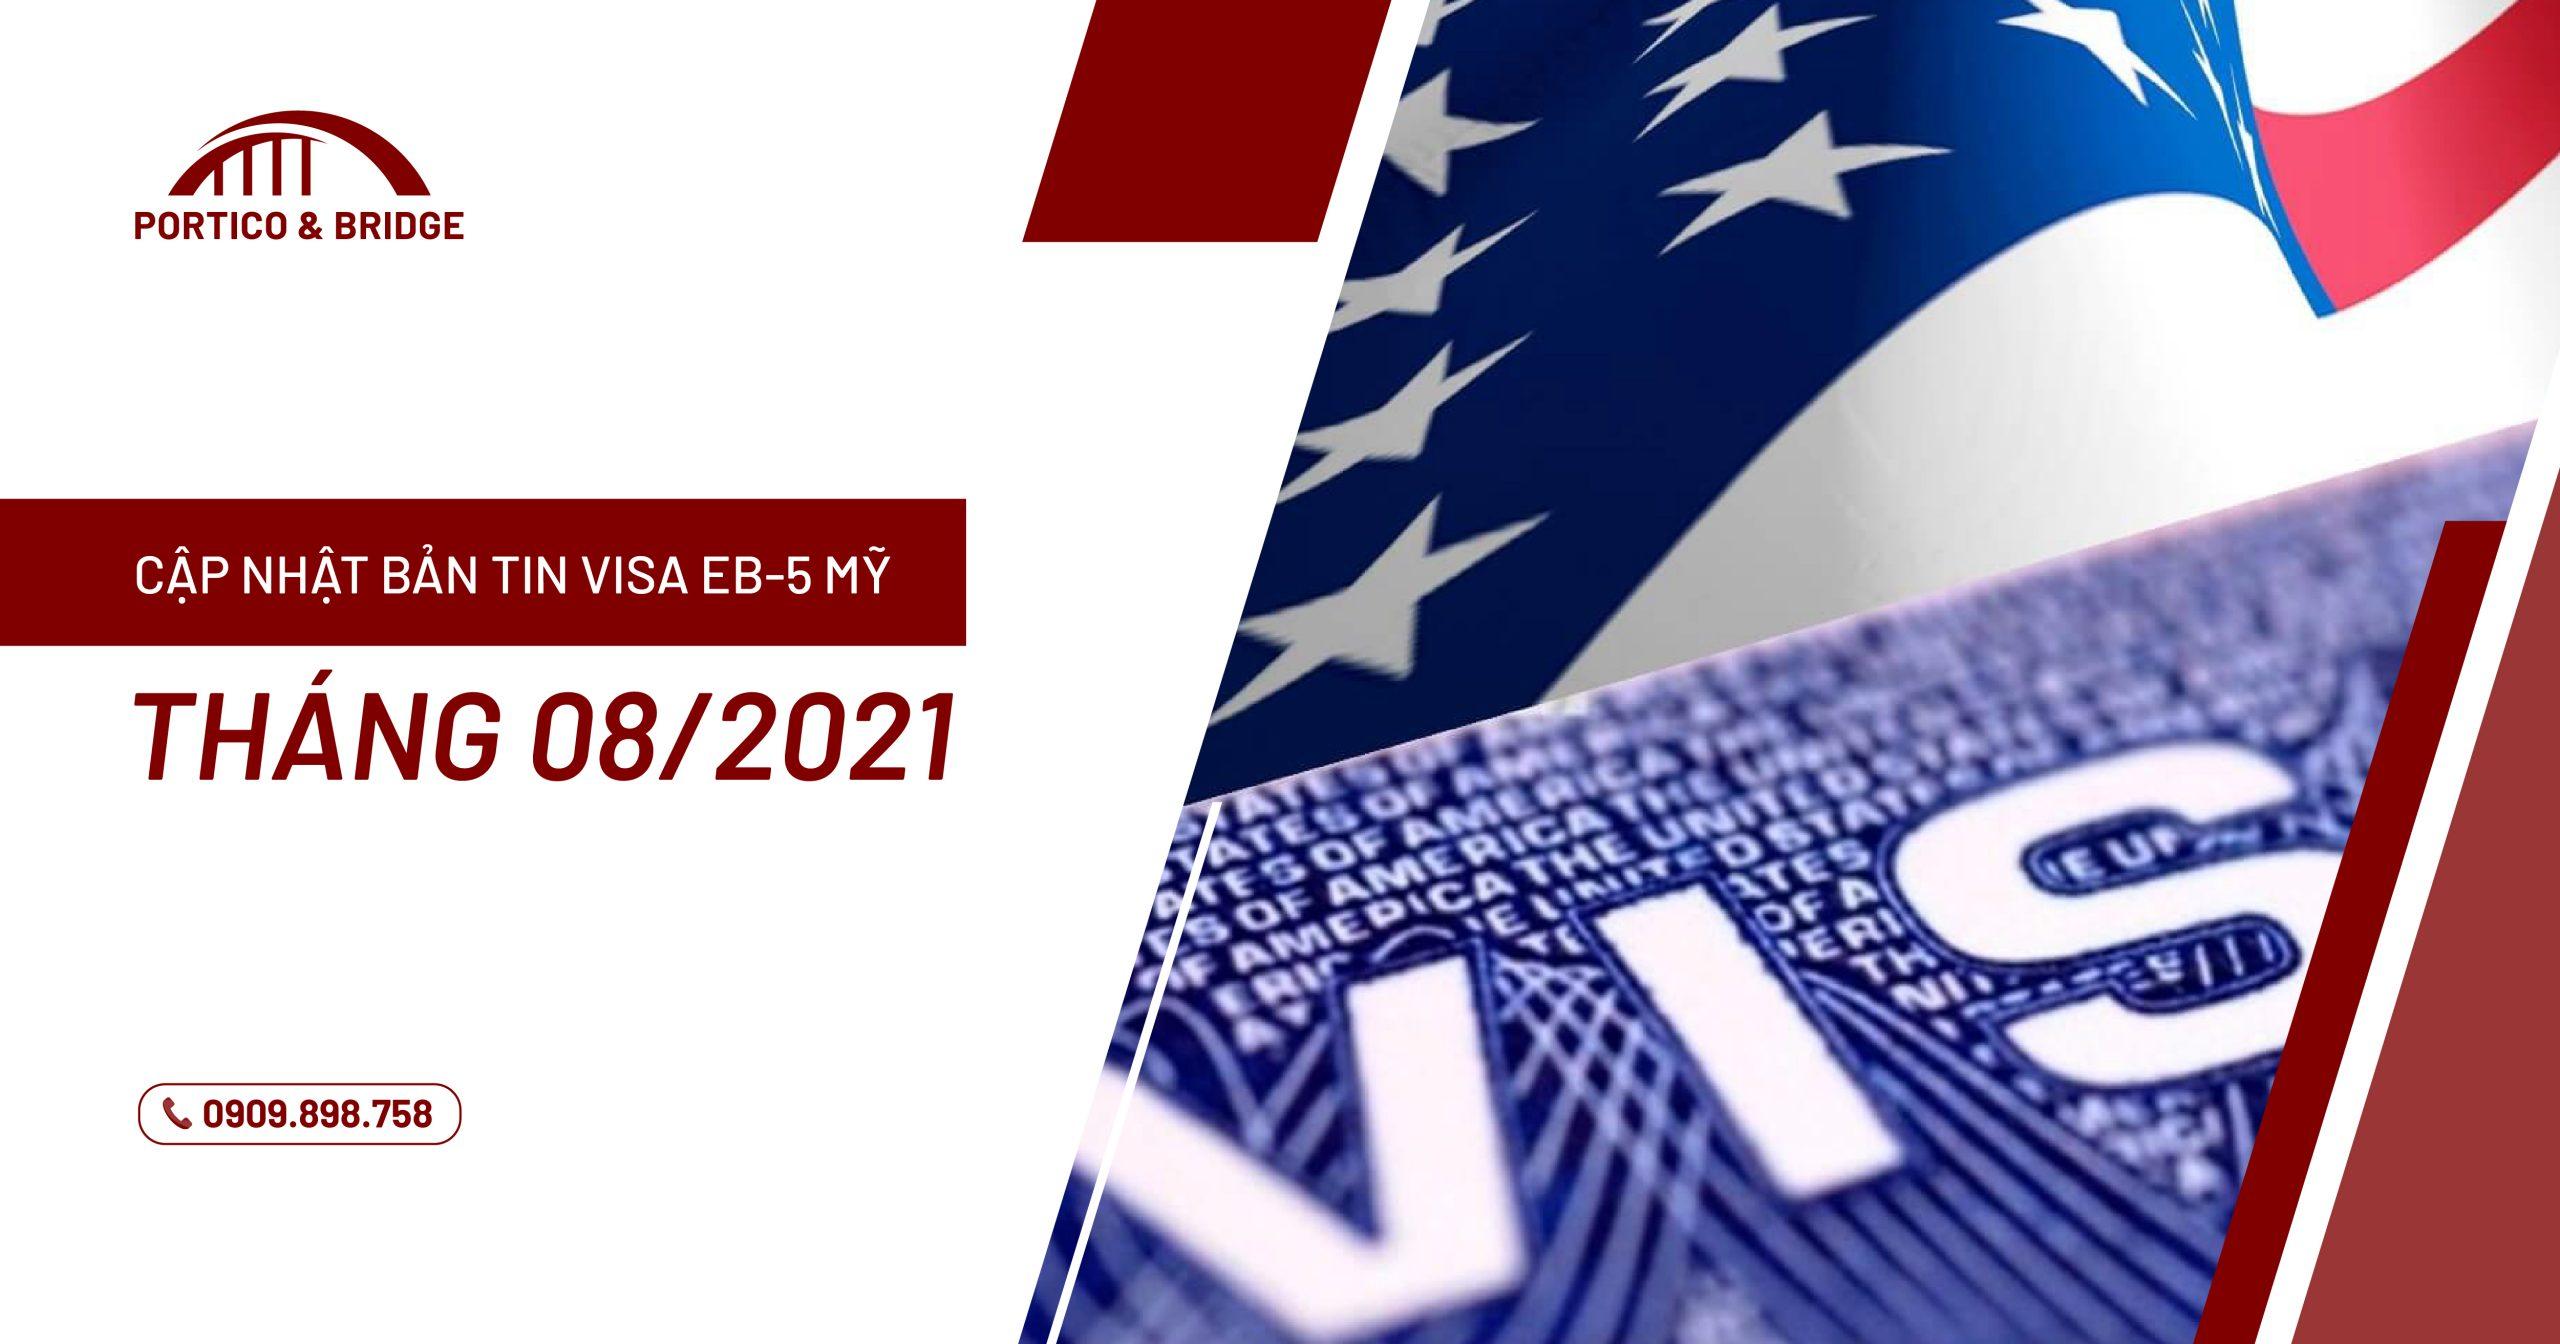 visa EB-5 Mỹ